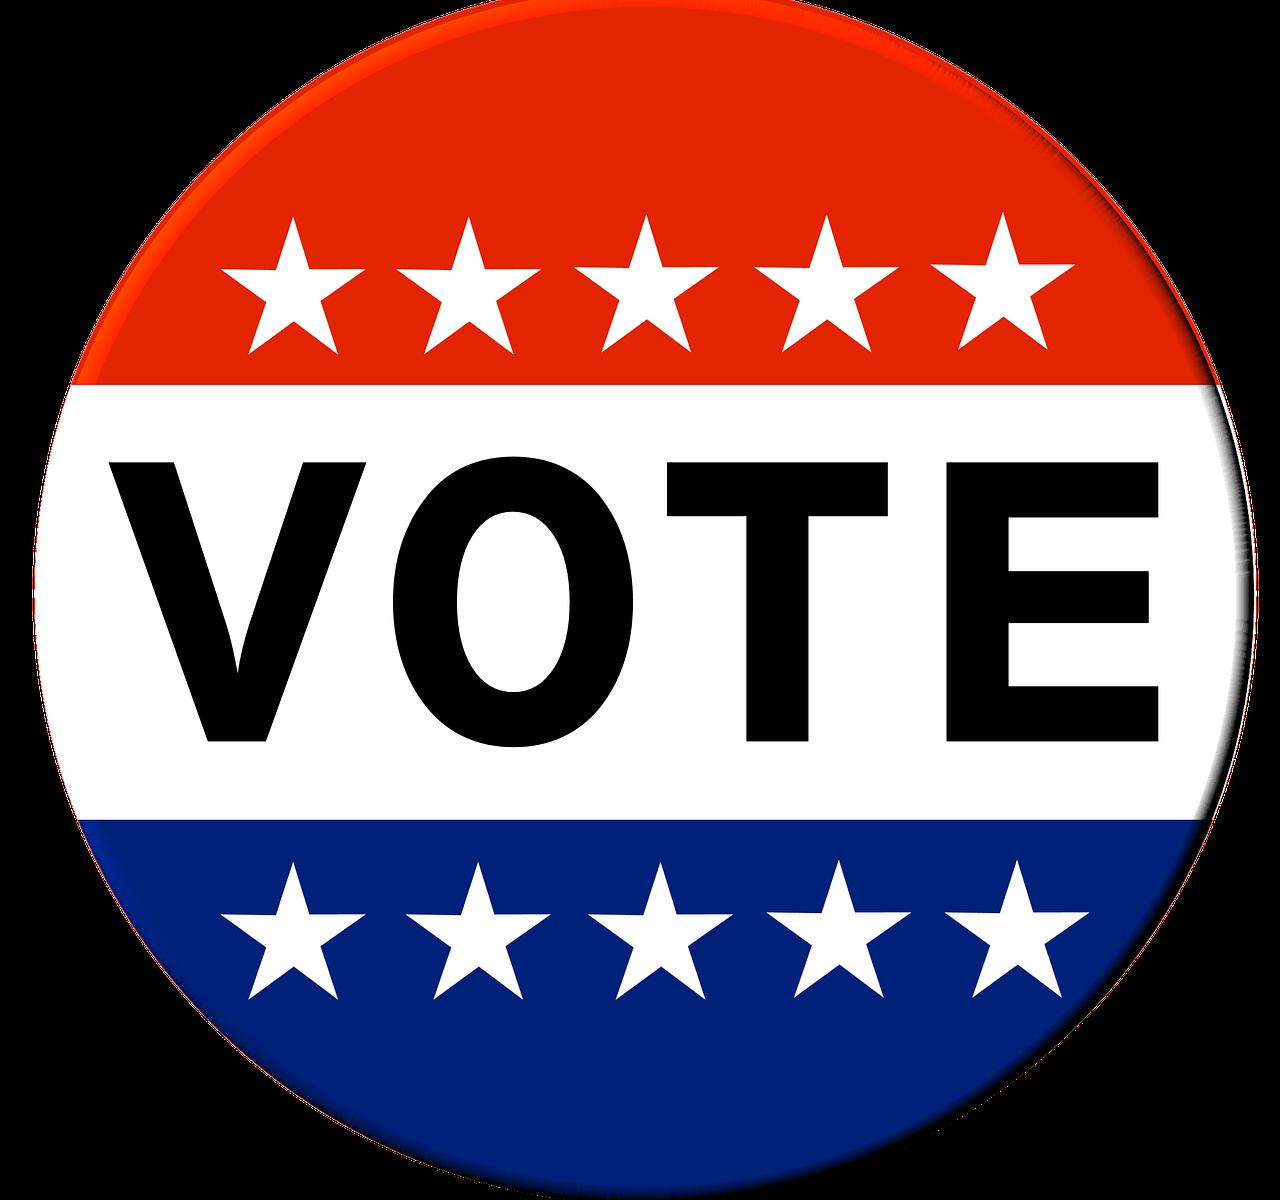 California hoa condo co. Want clipart poll tax